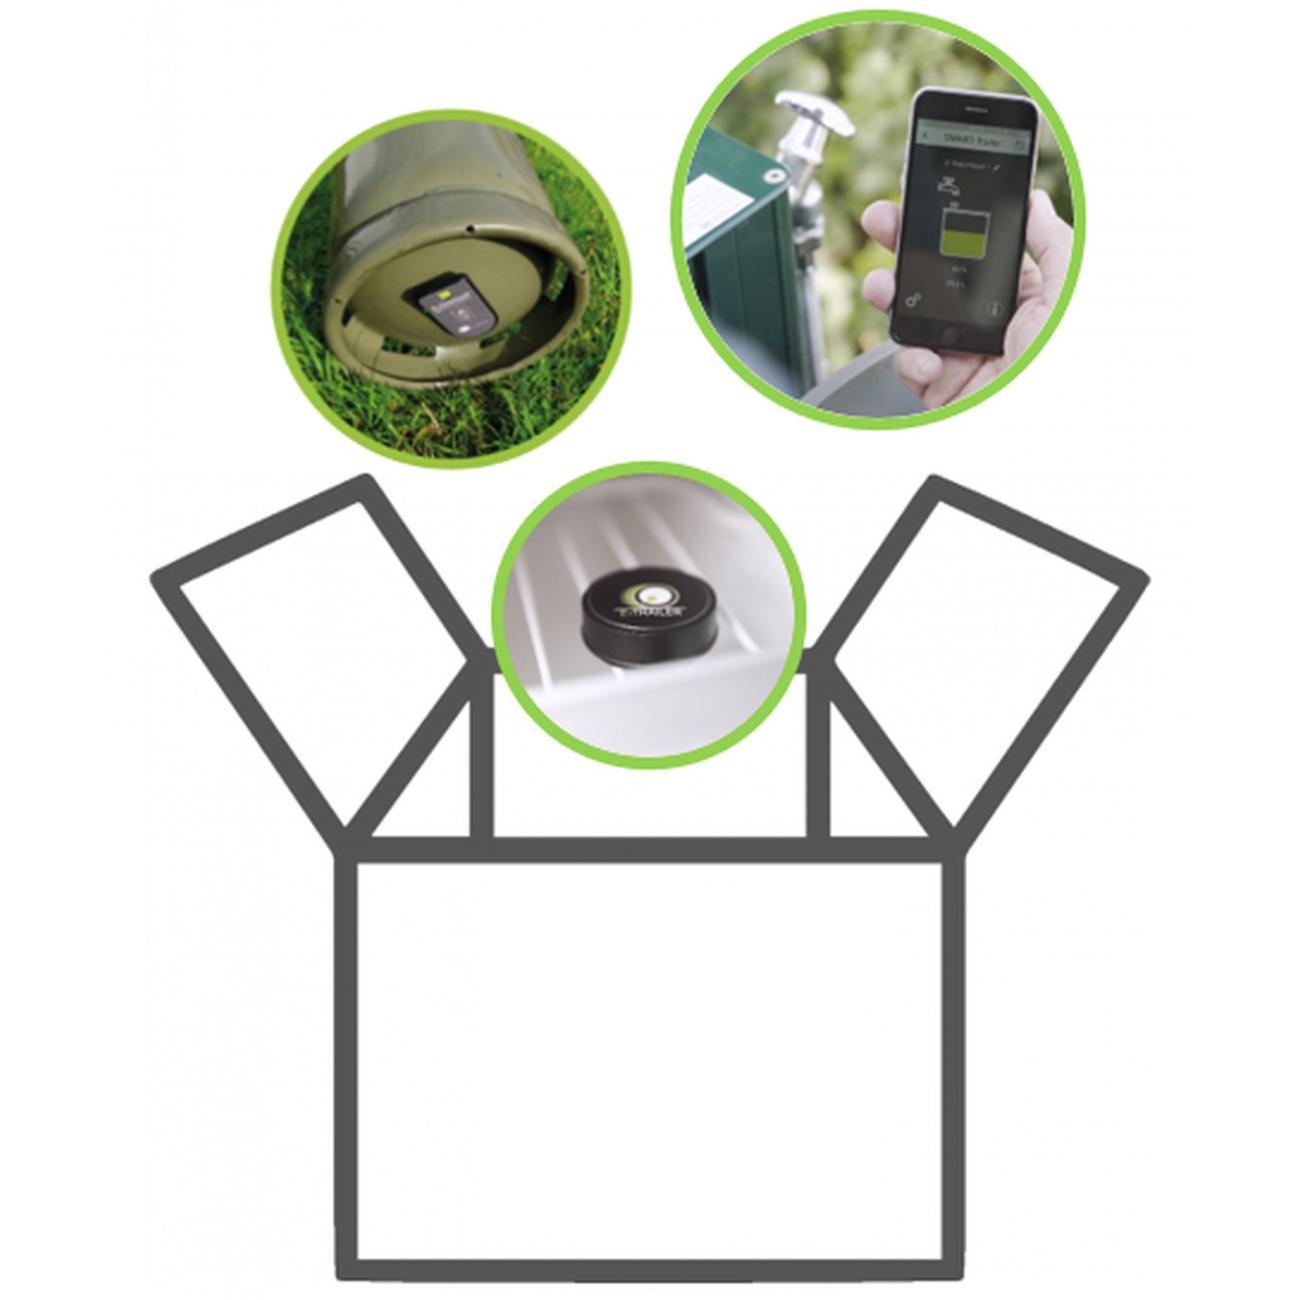 E-Trailer Comfort  (Temp-Gas-Waterlevel)